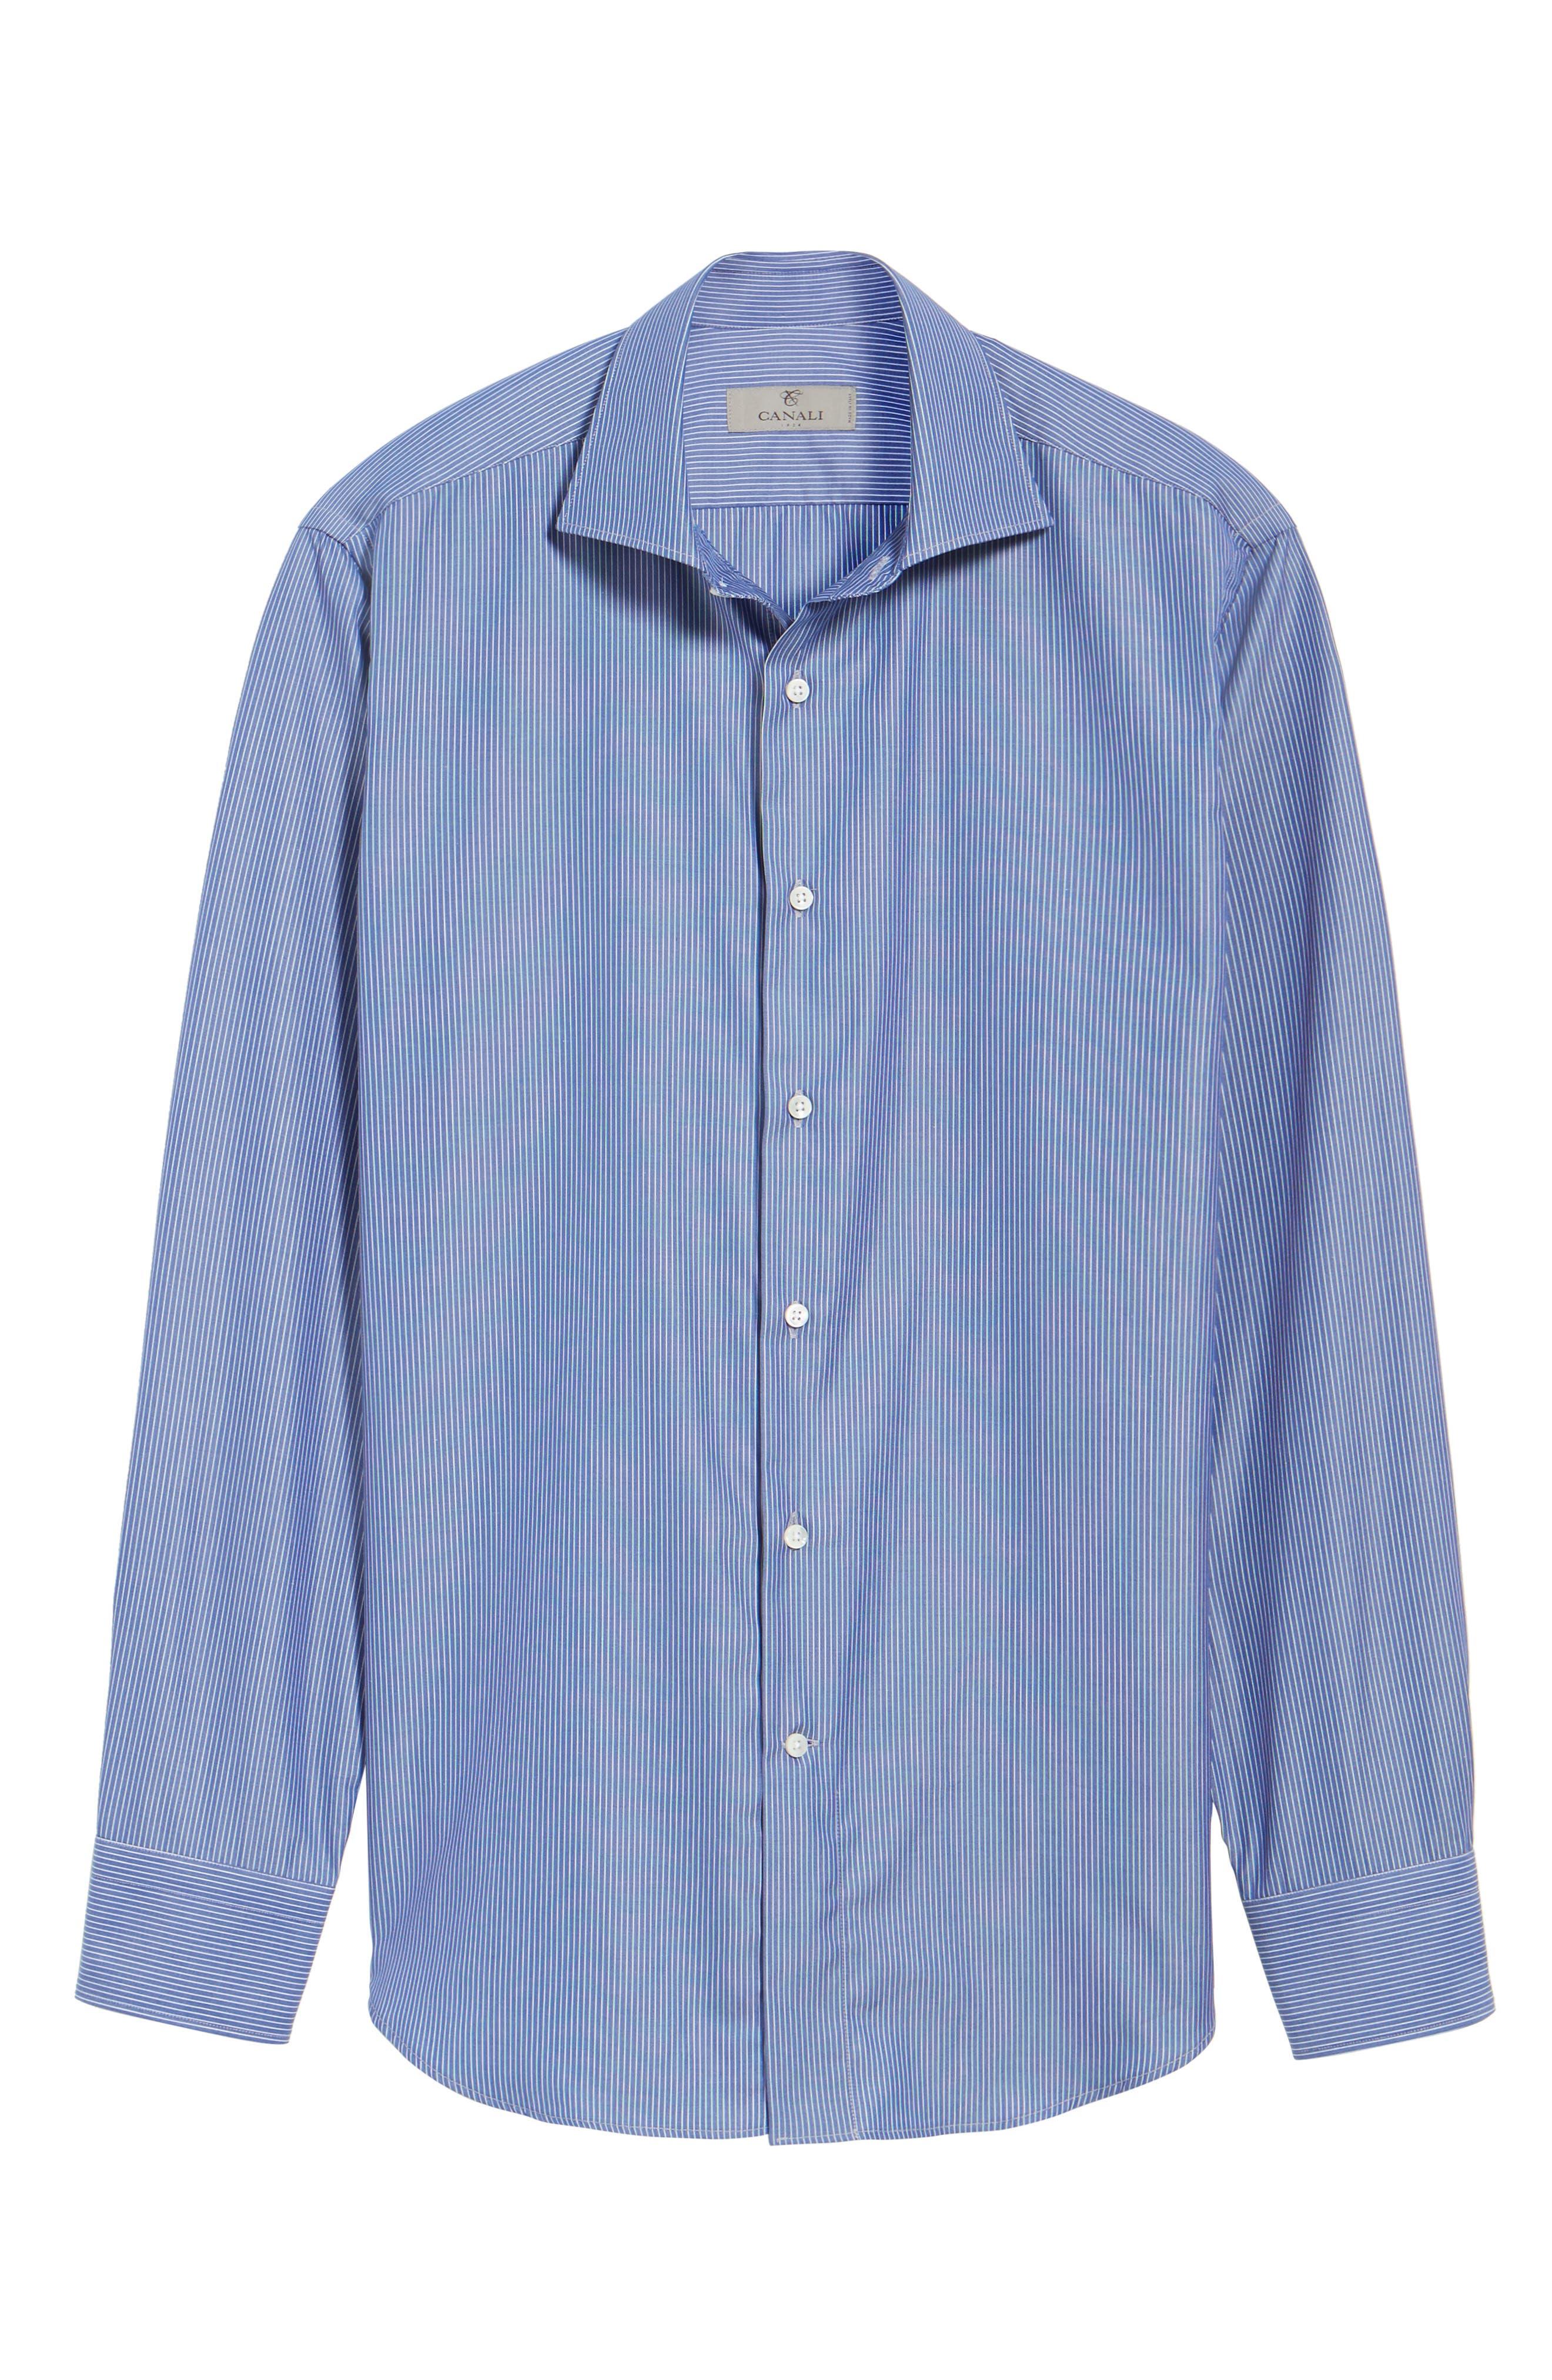 Alternate Image 5  - Canali Regular Fit Stripe Dress Shirt